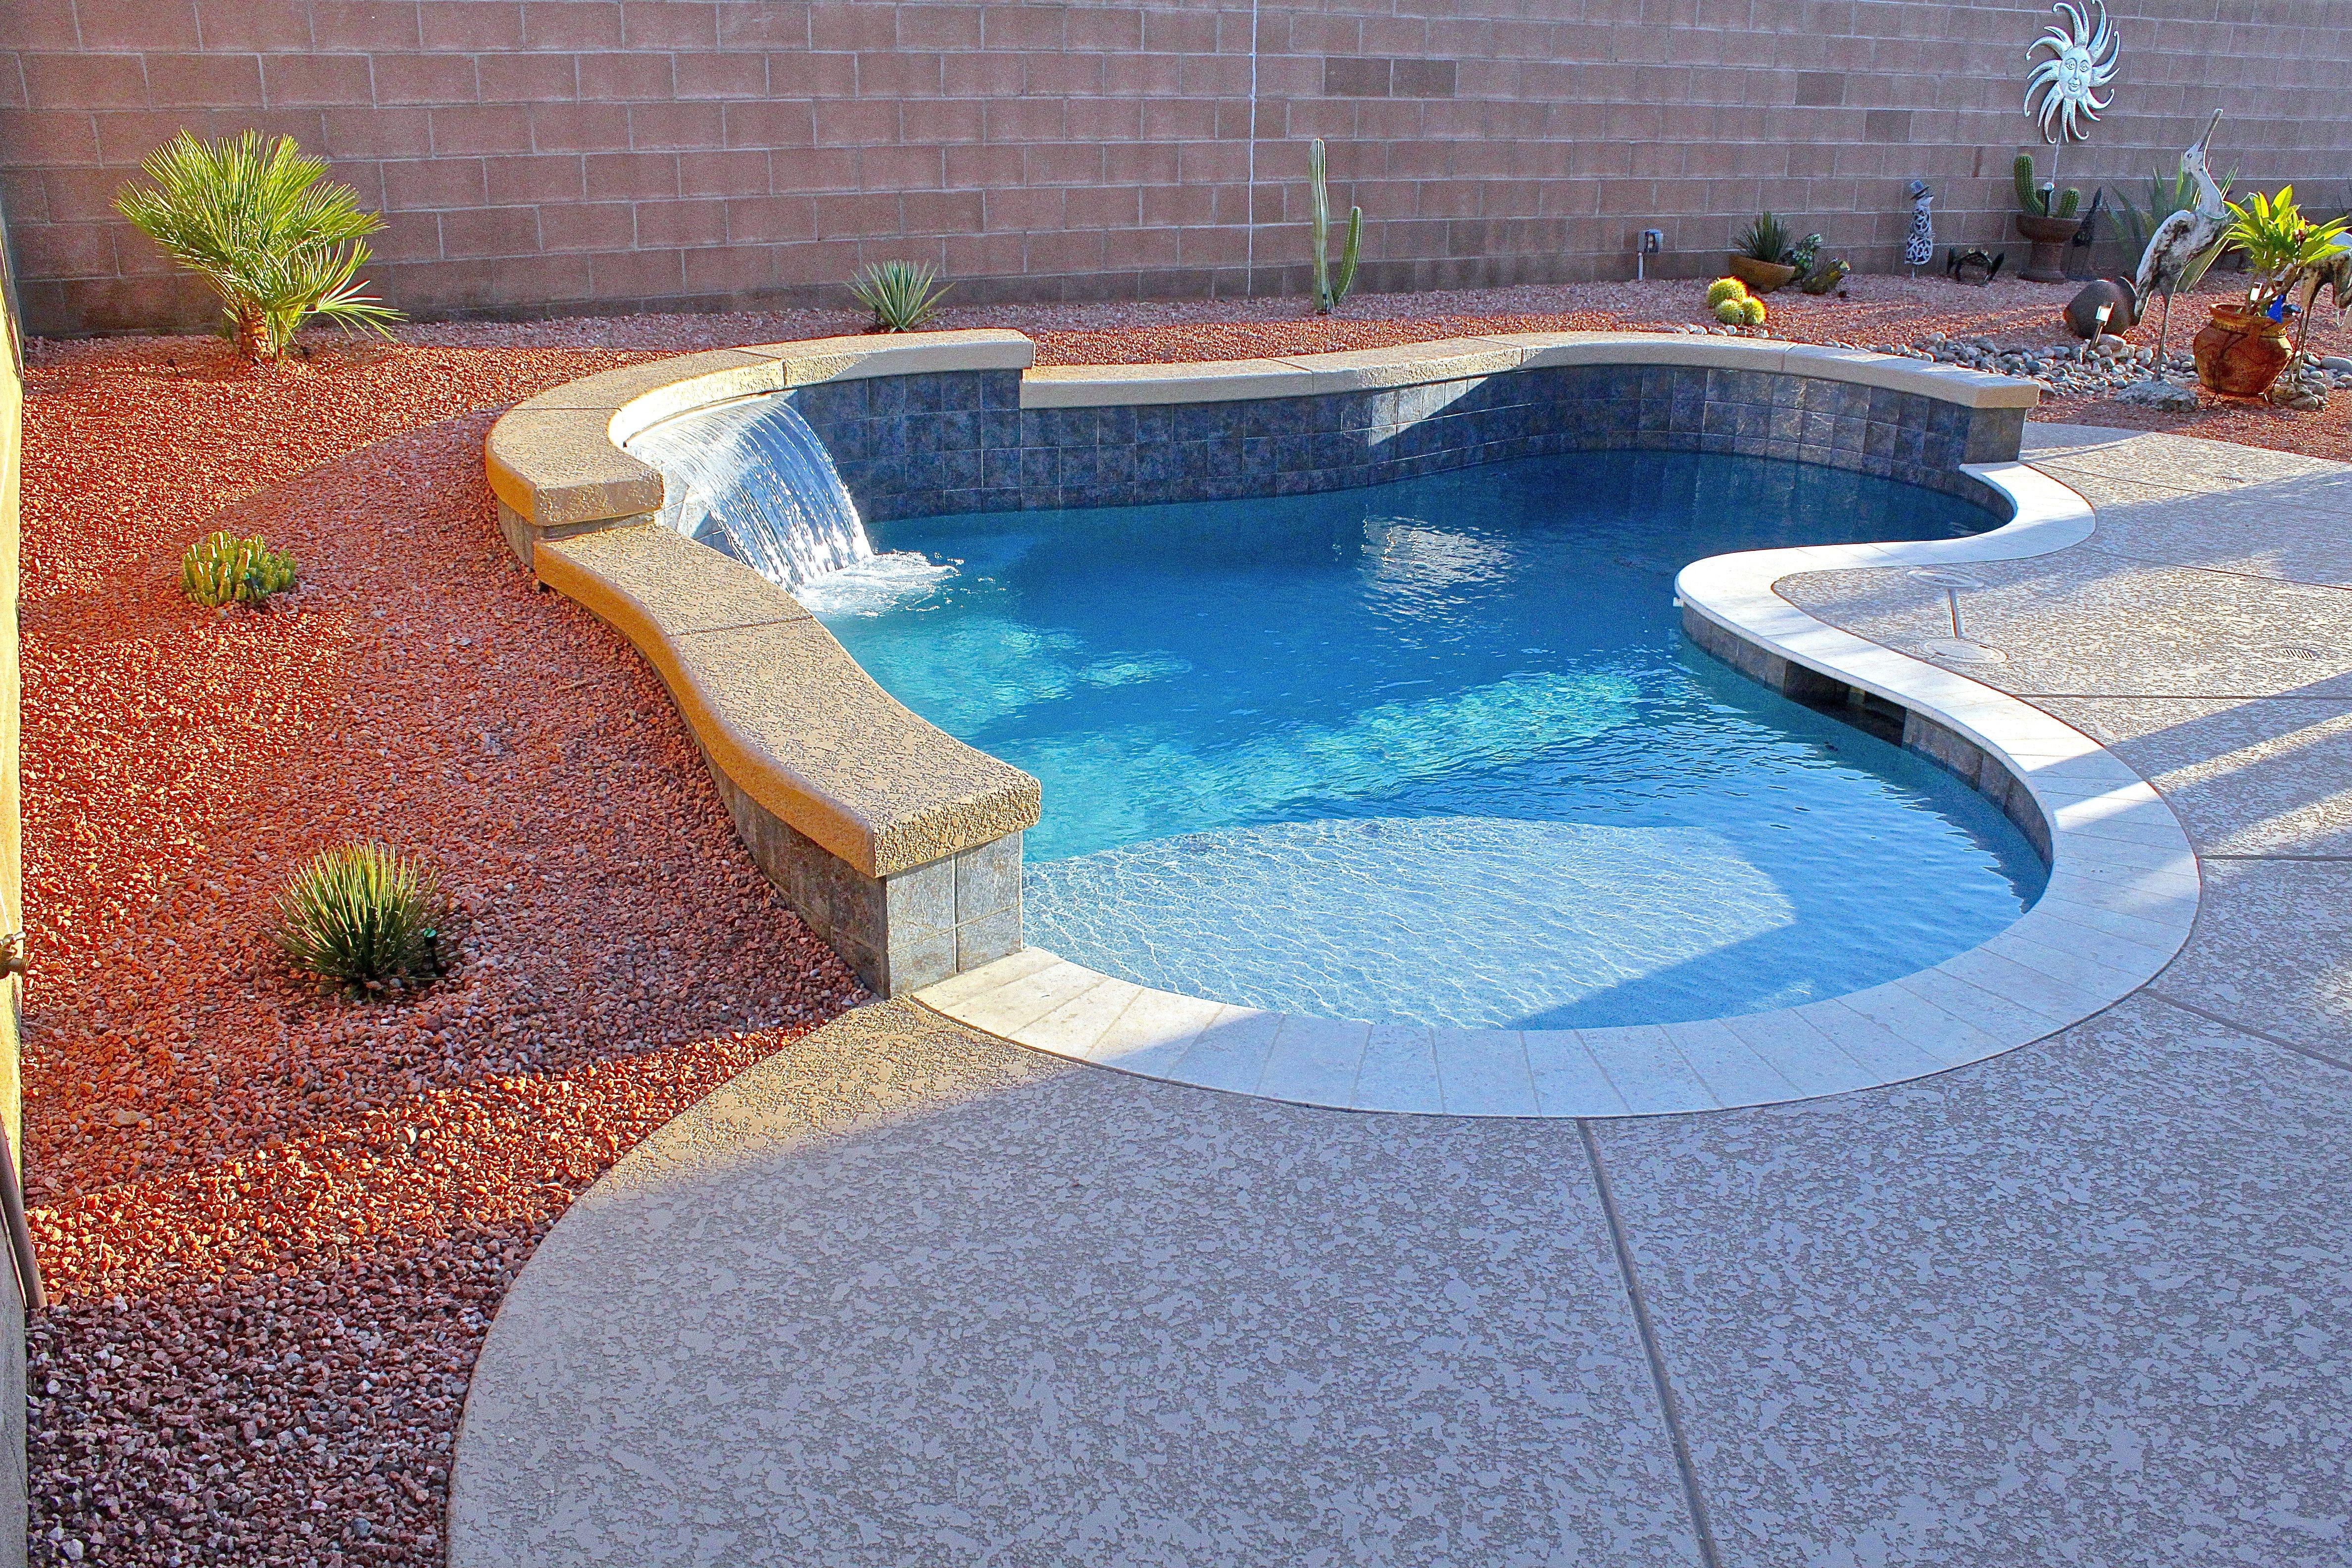 Pools Photo Gallery Custom Inground Pools Surprise Arizona Rainfall Freeform Pool With Sheer Descent Wate Backyard Pool Designs Custom Inground Pools Pool